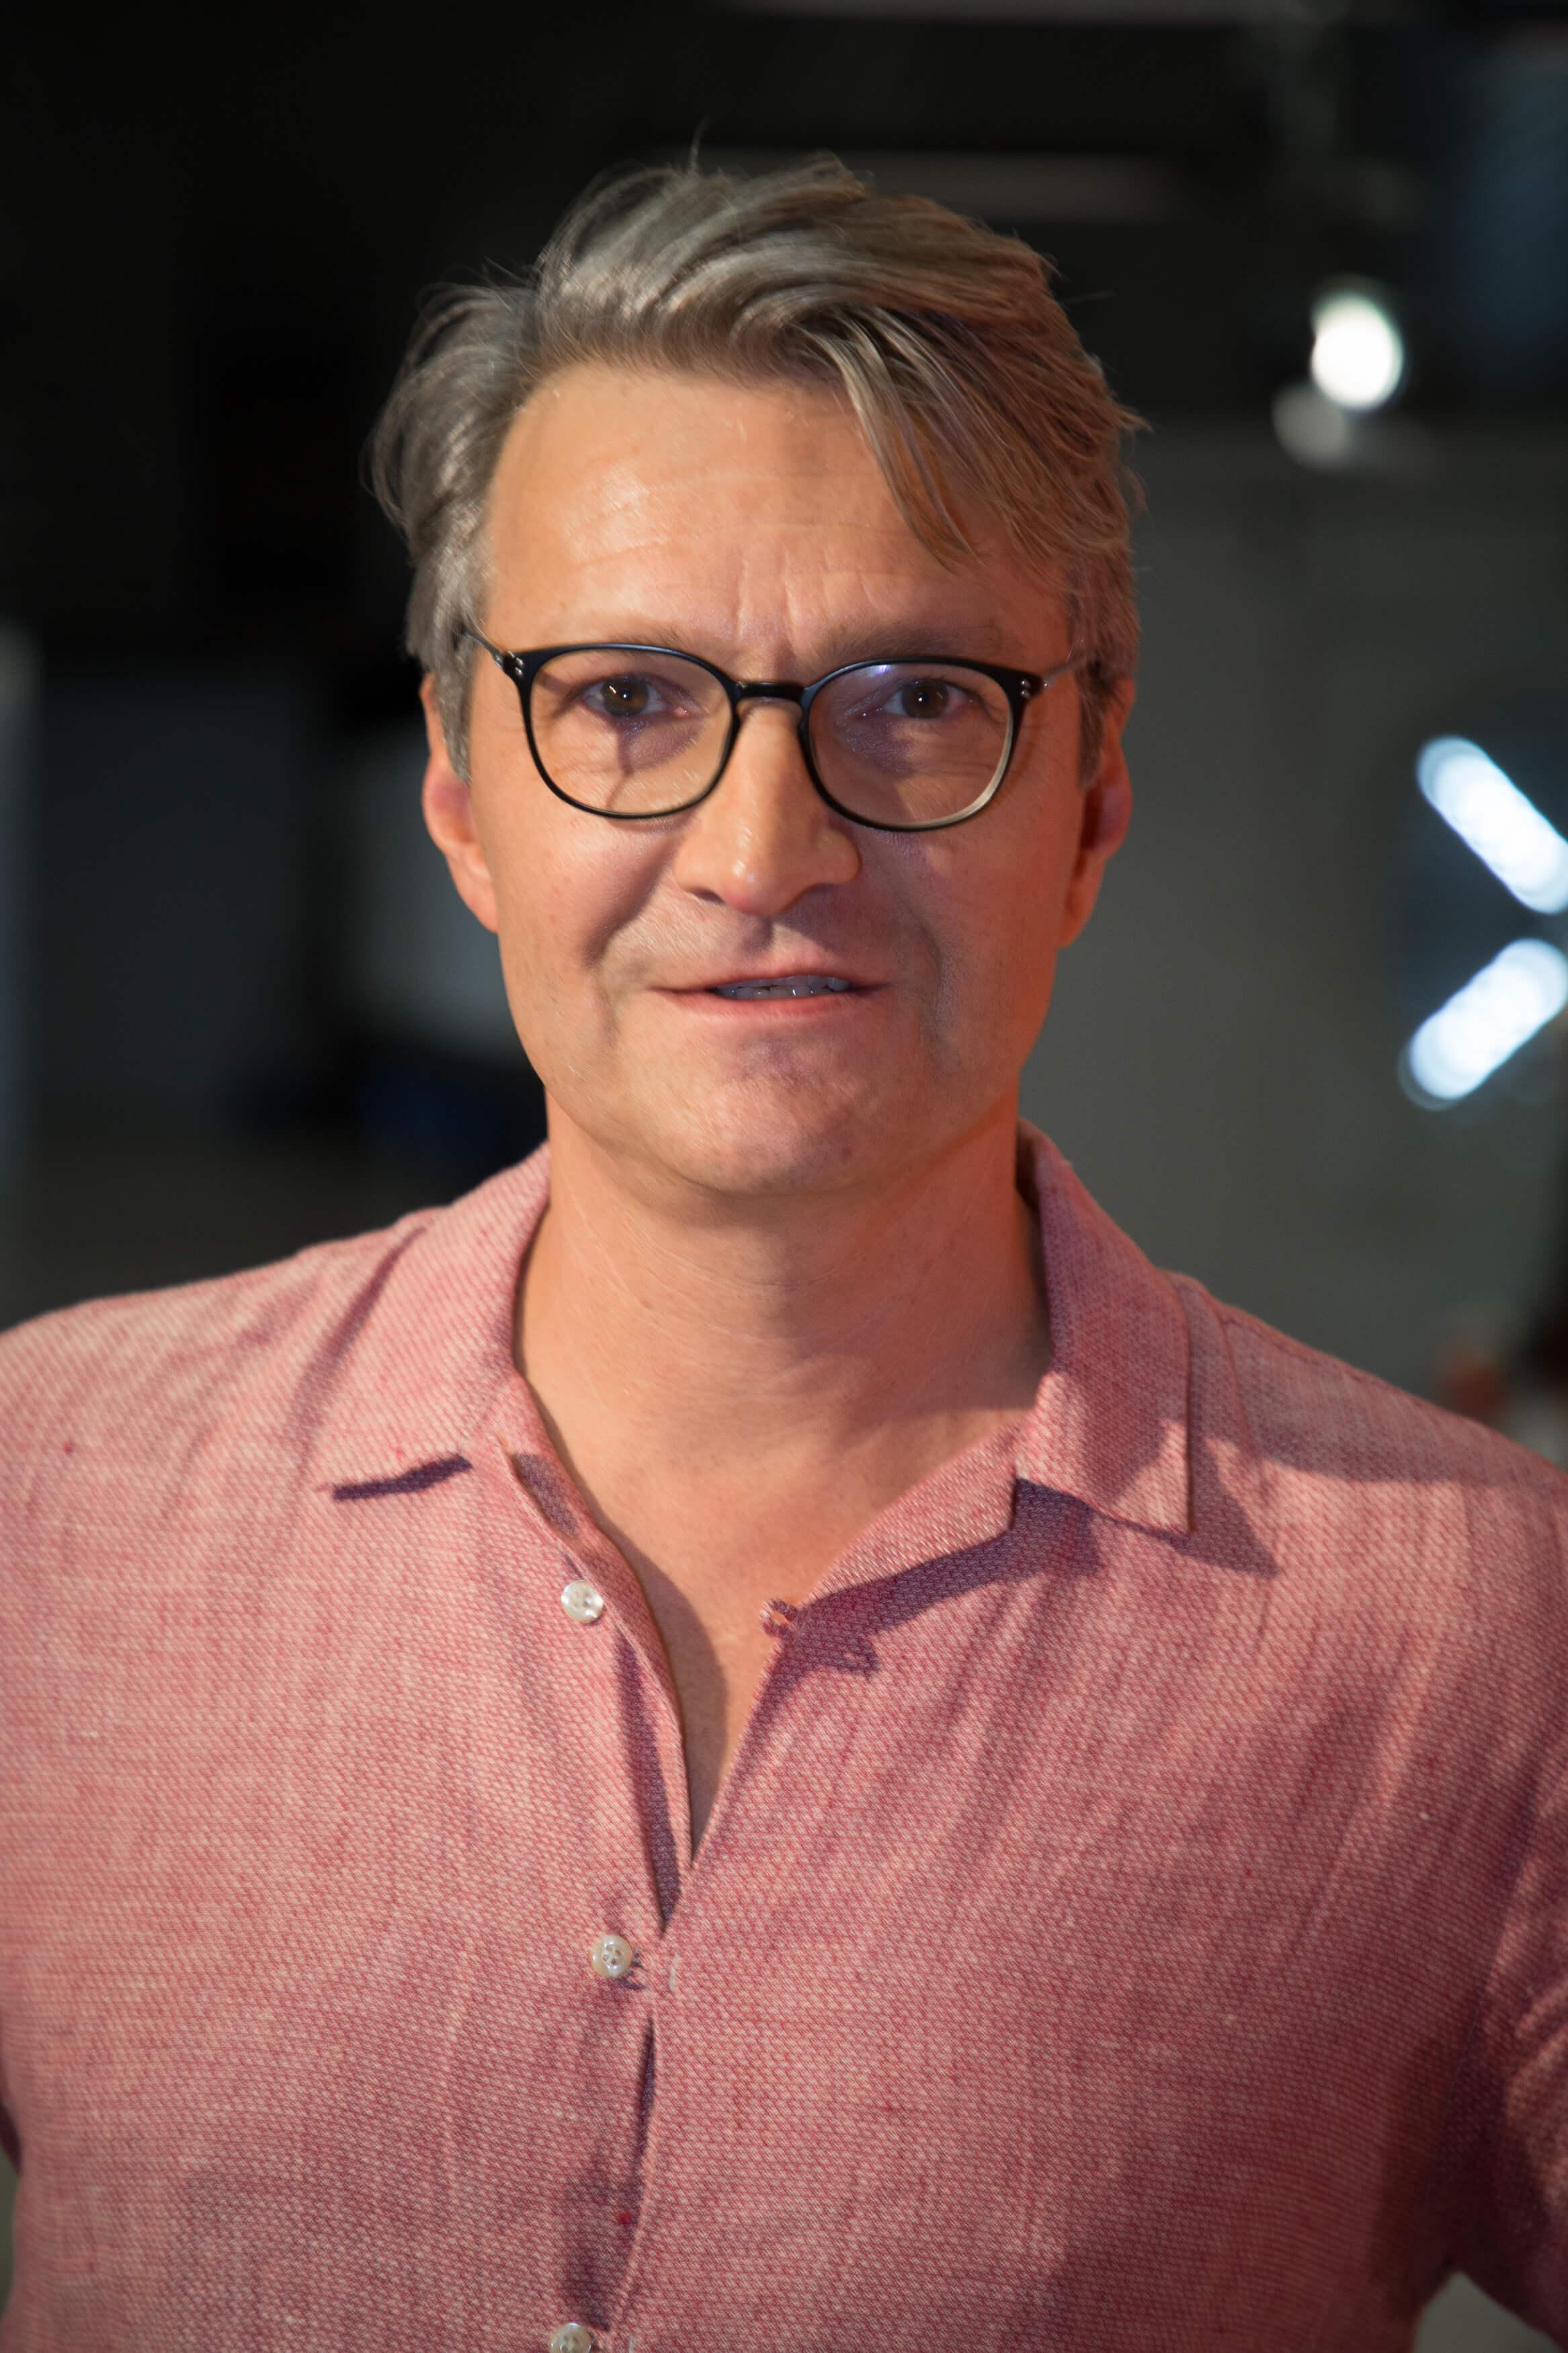 Úvod k filmu Akumulátor 1, režisér Jan Svěrák. Foto Film Servis Festival Karlovy Vary